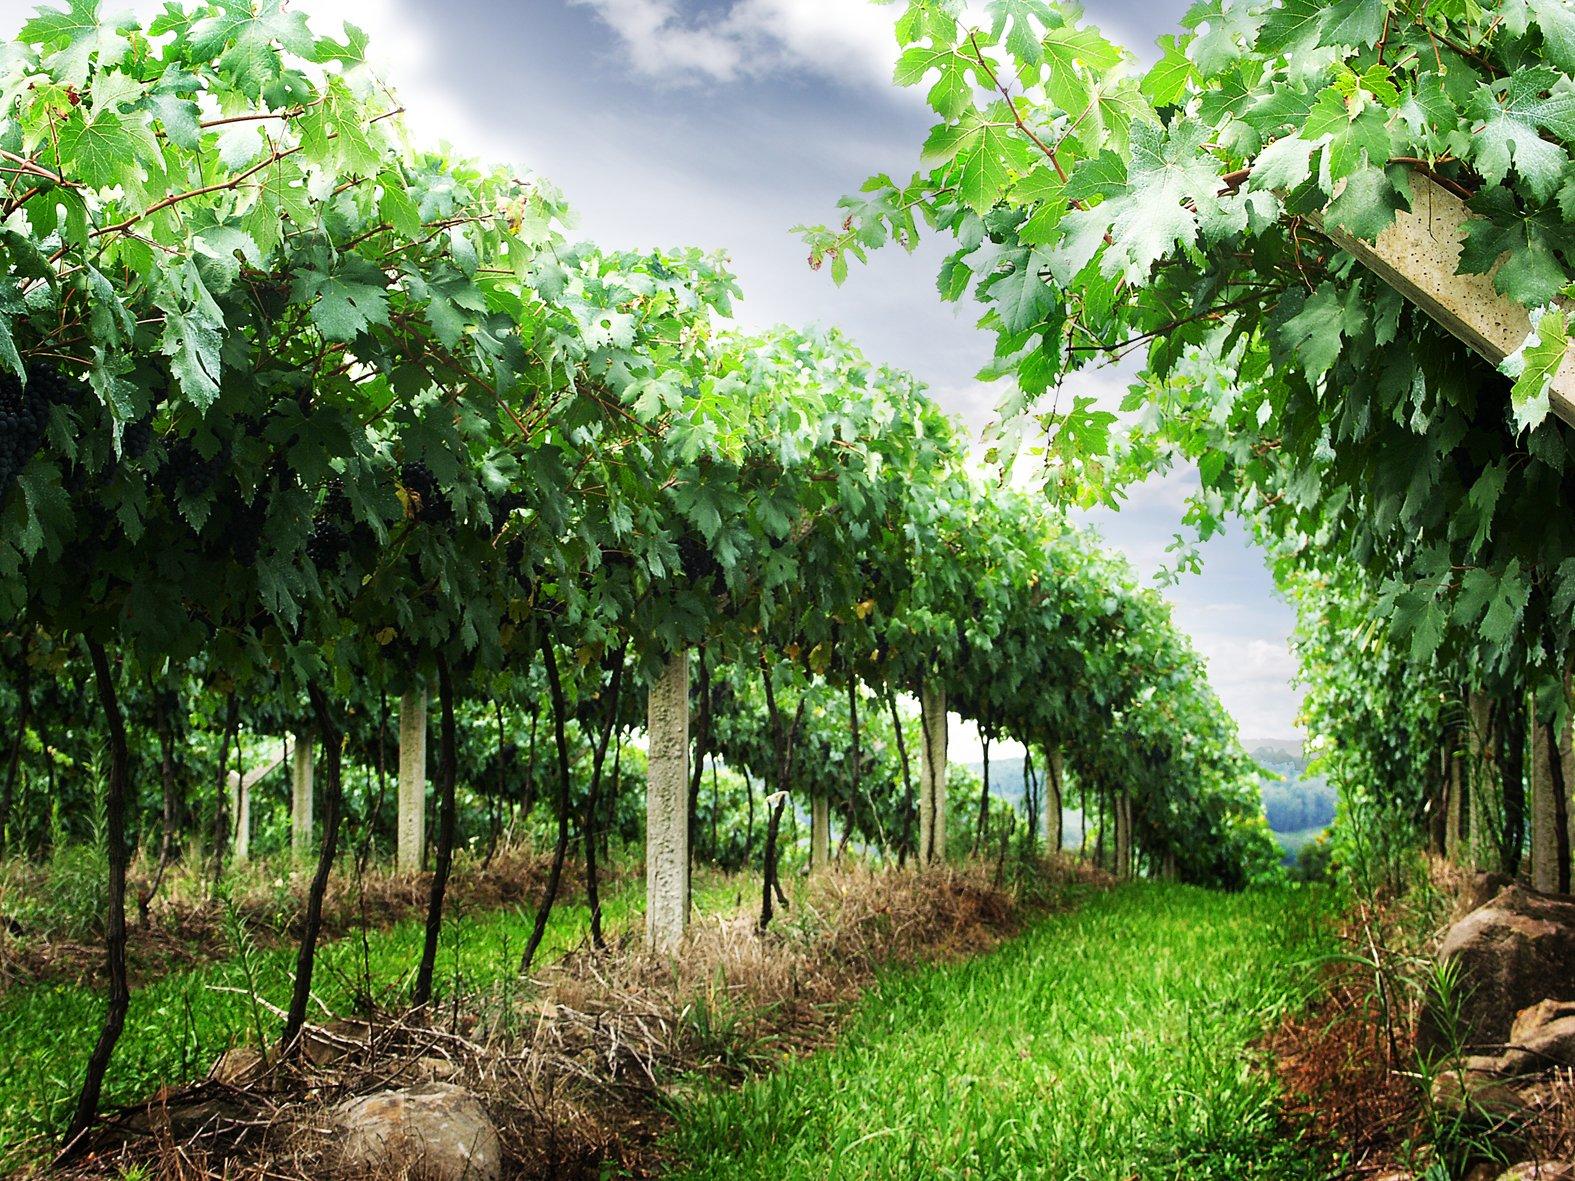 Z Poysdorfu do Falkensteinu - Vinicemi mezi dvěma vinařskými obcemi